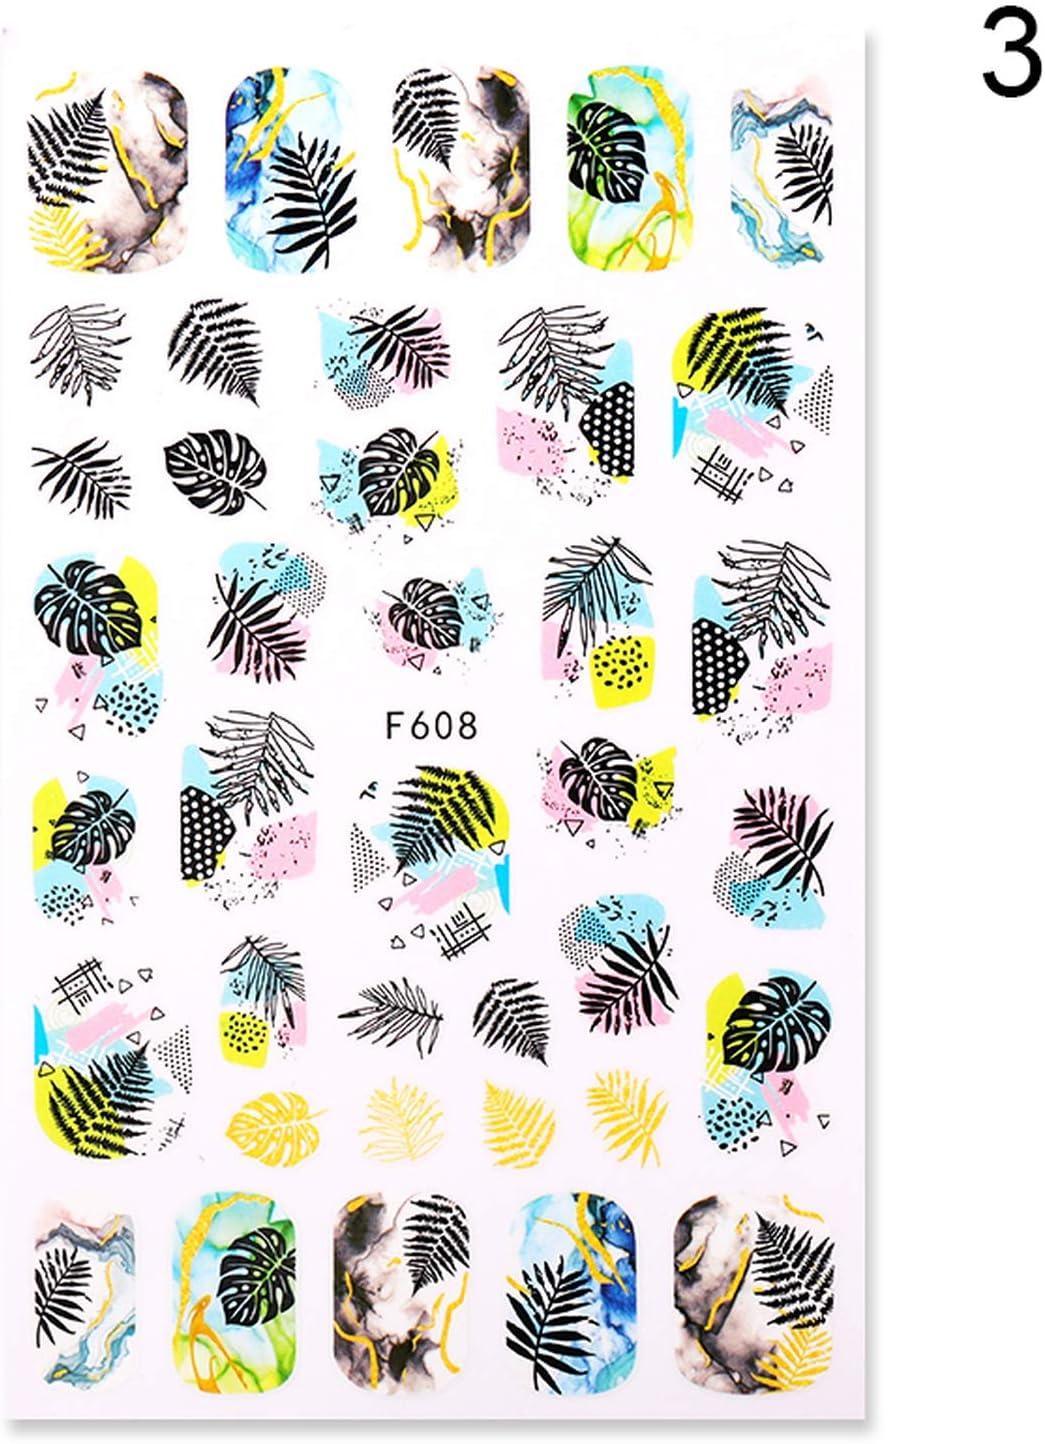 Accesorios para uñas Pegatinas Serie de flores Pegatinas de agua para uñas Pegatinas Sakura Daisy Lavender Floral Pattern Transfer Sticker Nail Art Decoration-6-,